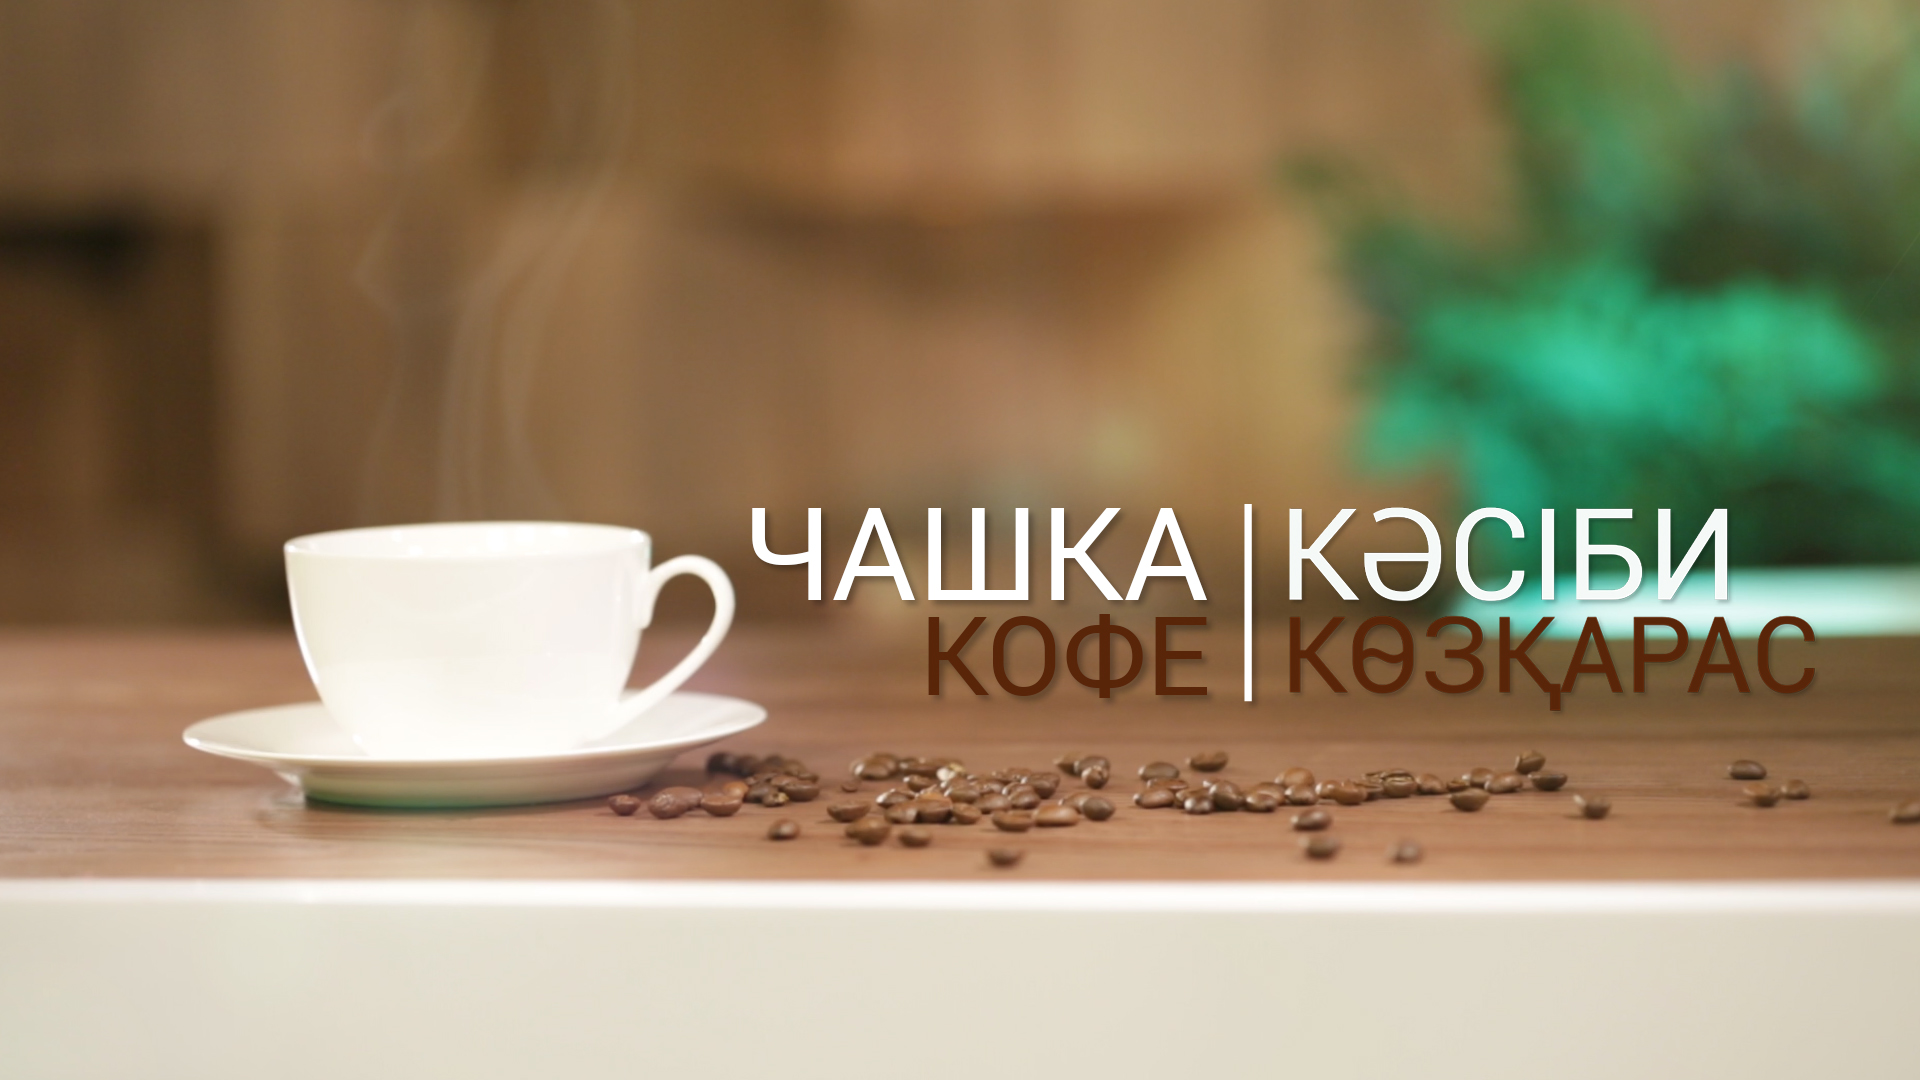 https://inbusiness.kz/ru/images/programbig/1/images/8u3ijam1.jpg